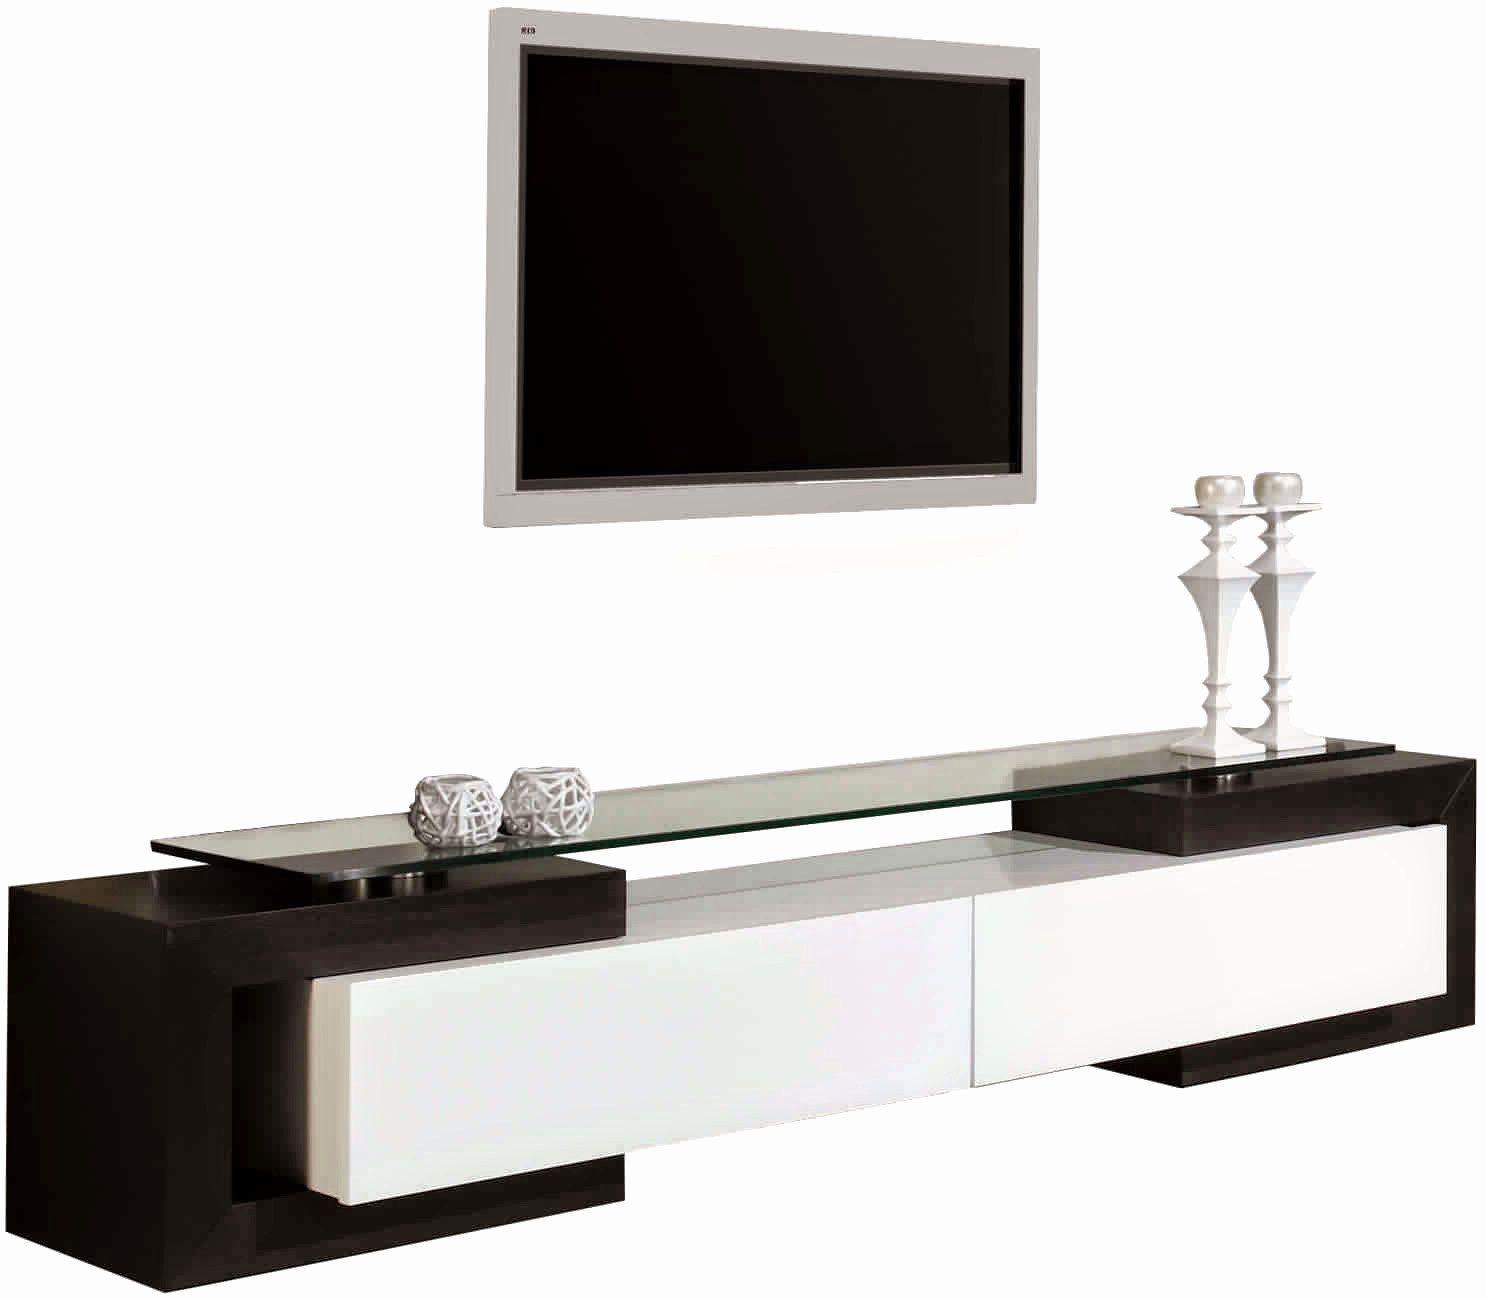 50 conforama meuble tele check more at